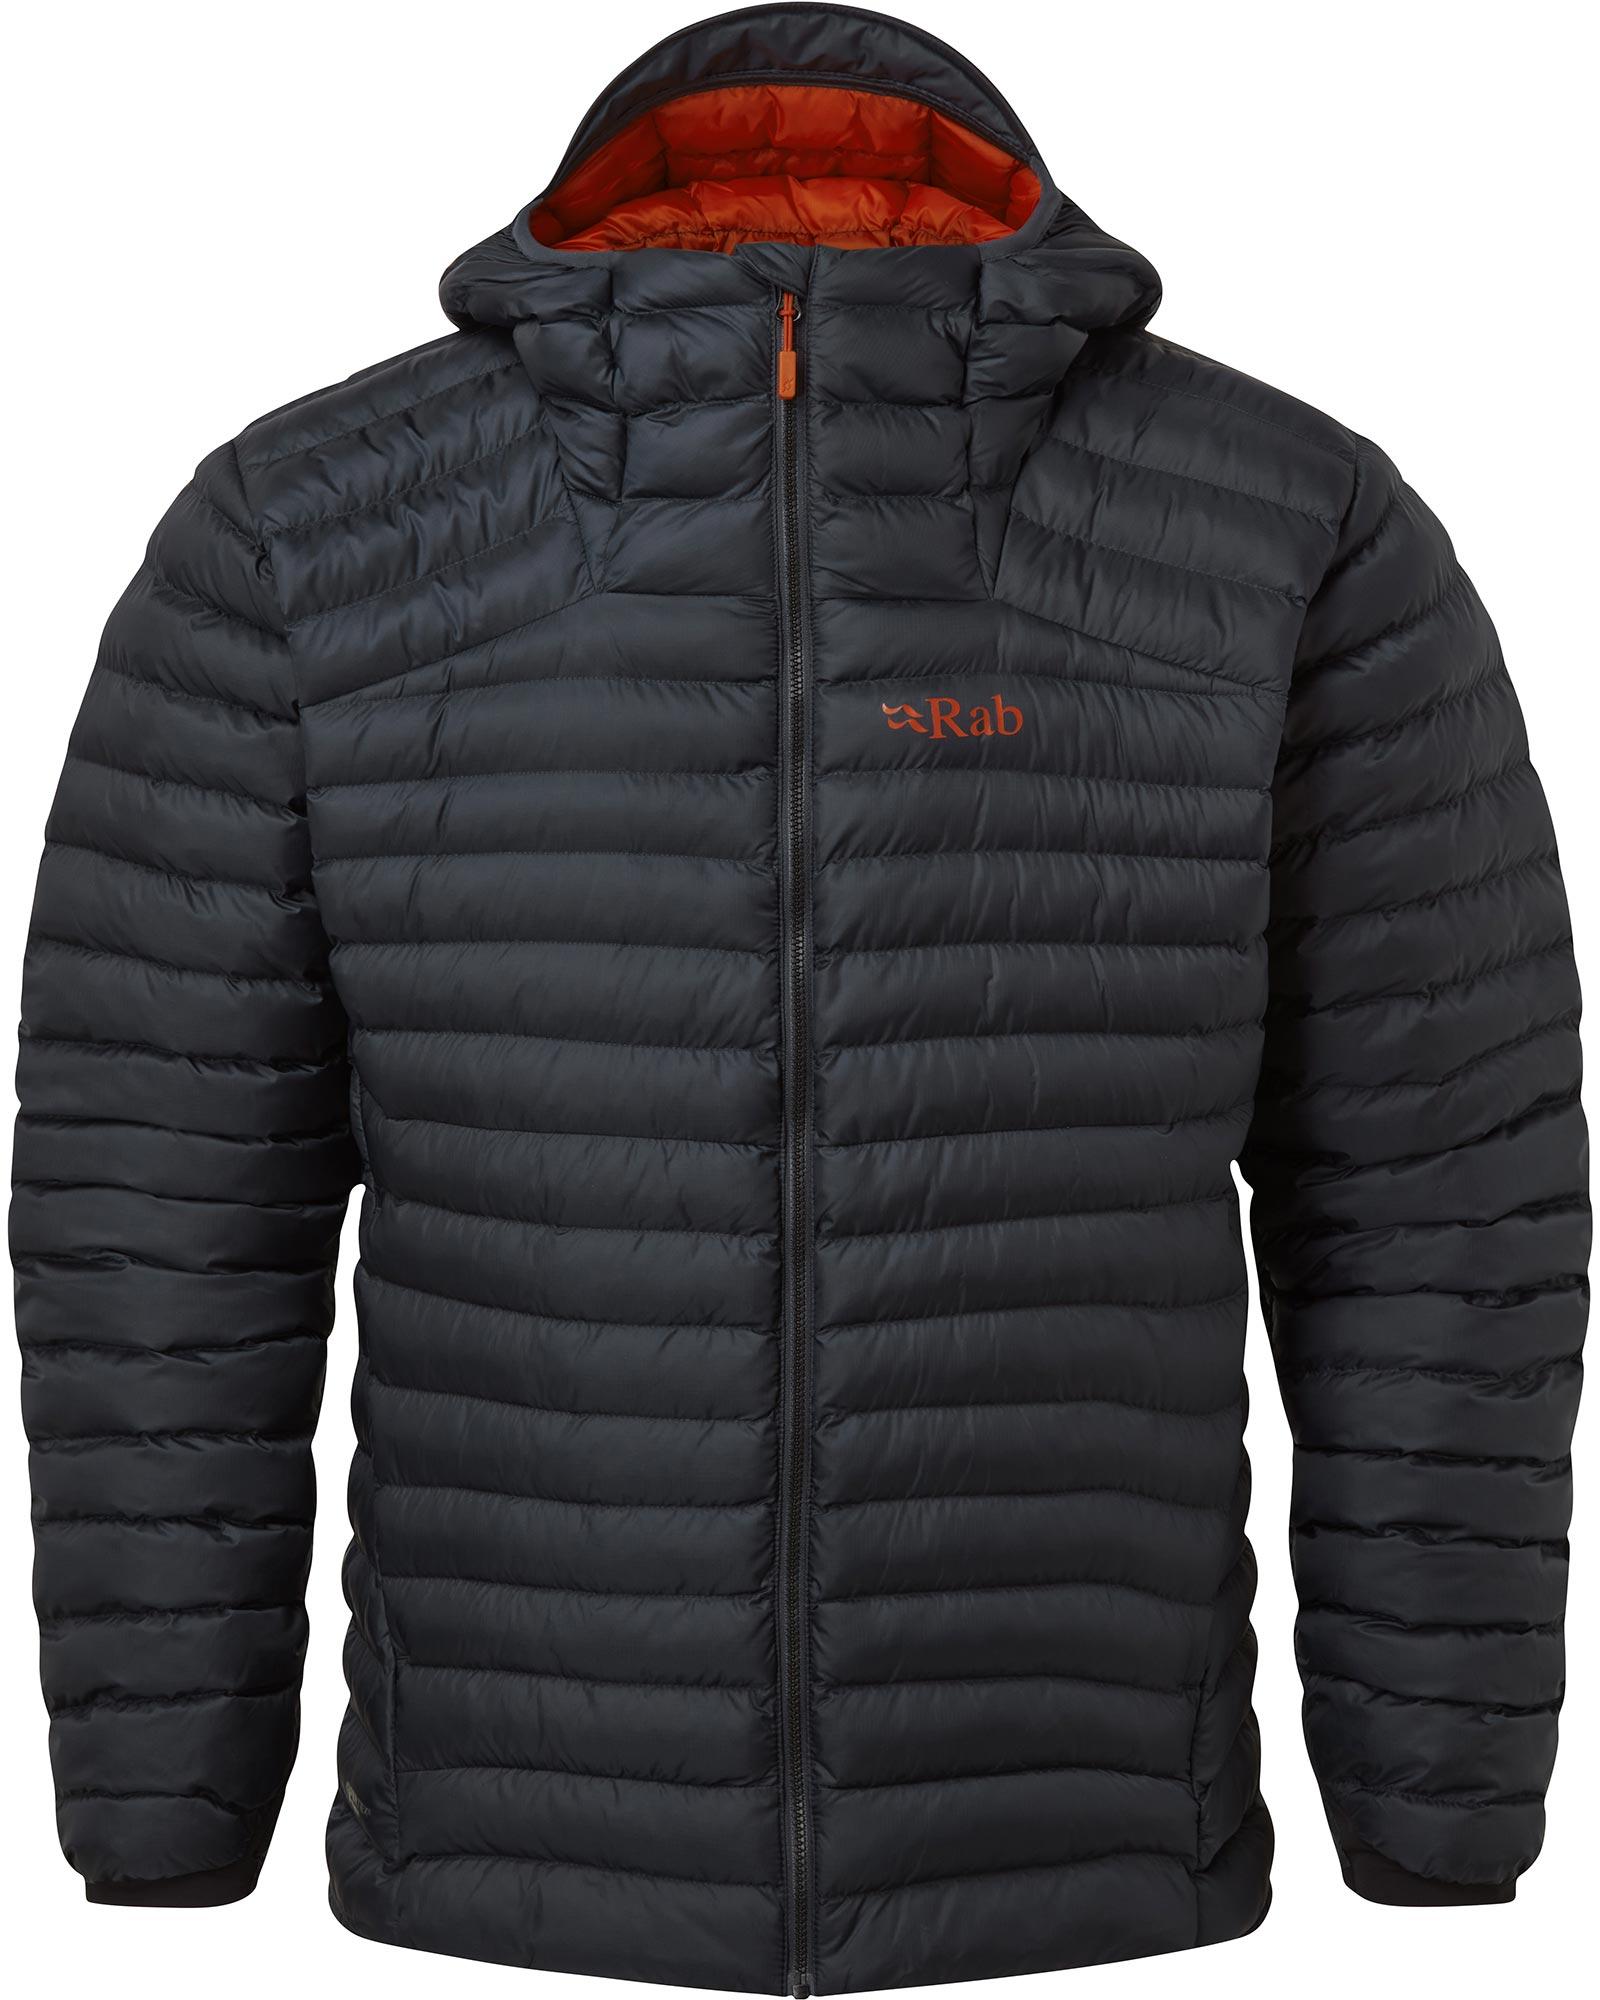 Rab Men's Cirrus Alpine Jacket 0